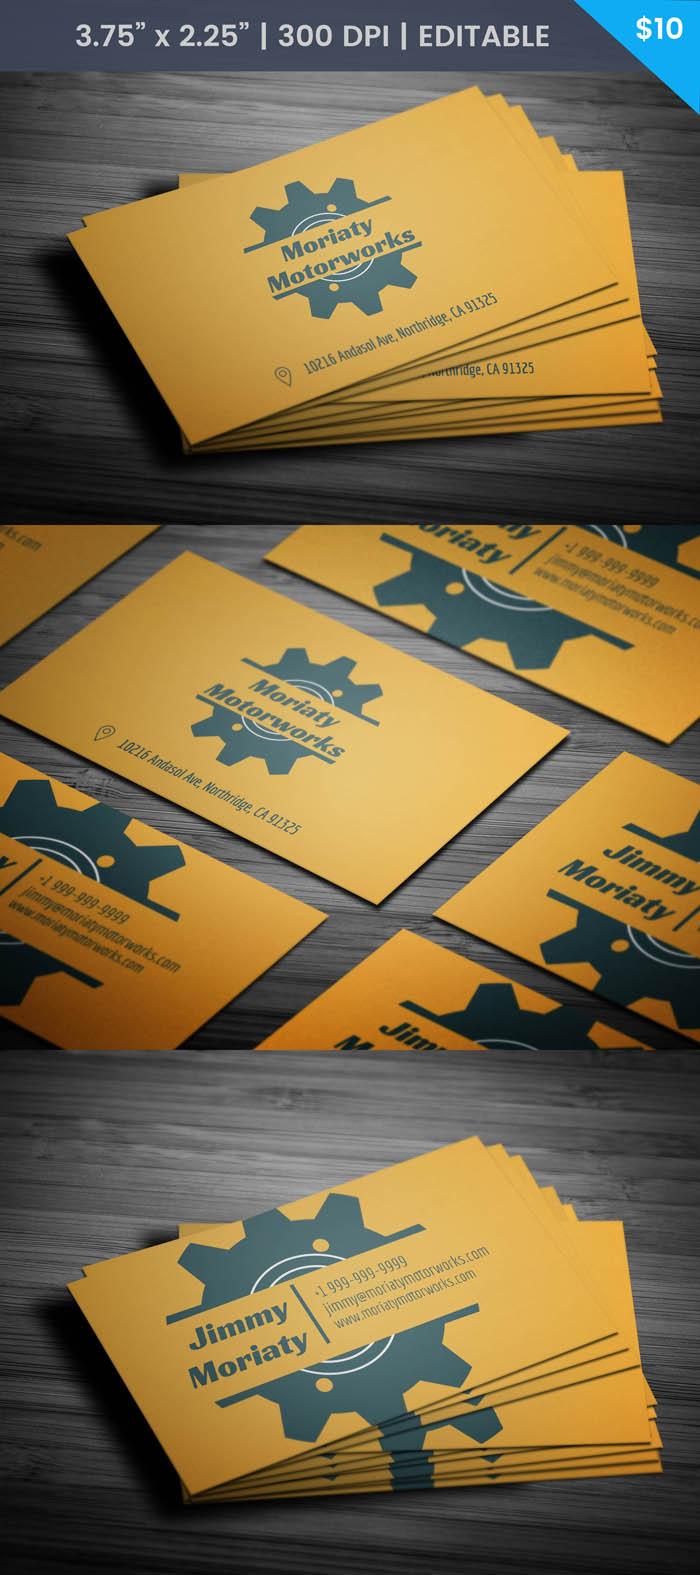 Free Minimal Mechanic Business Card Template #mechanic #businesscard